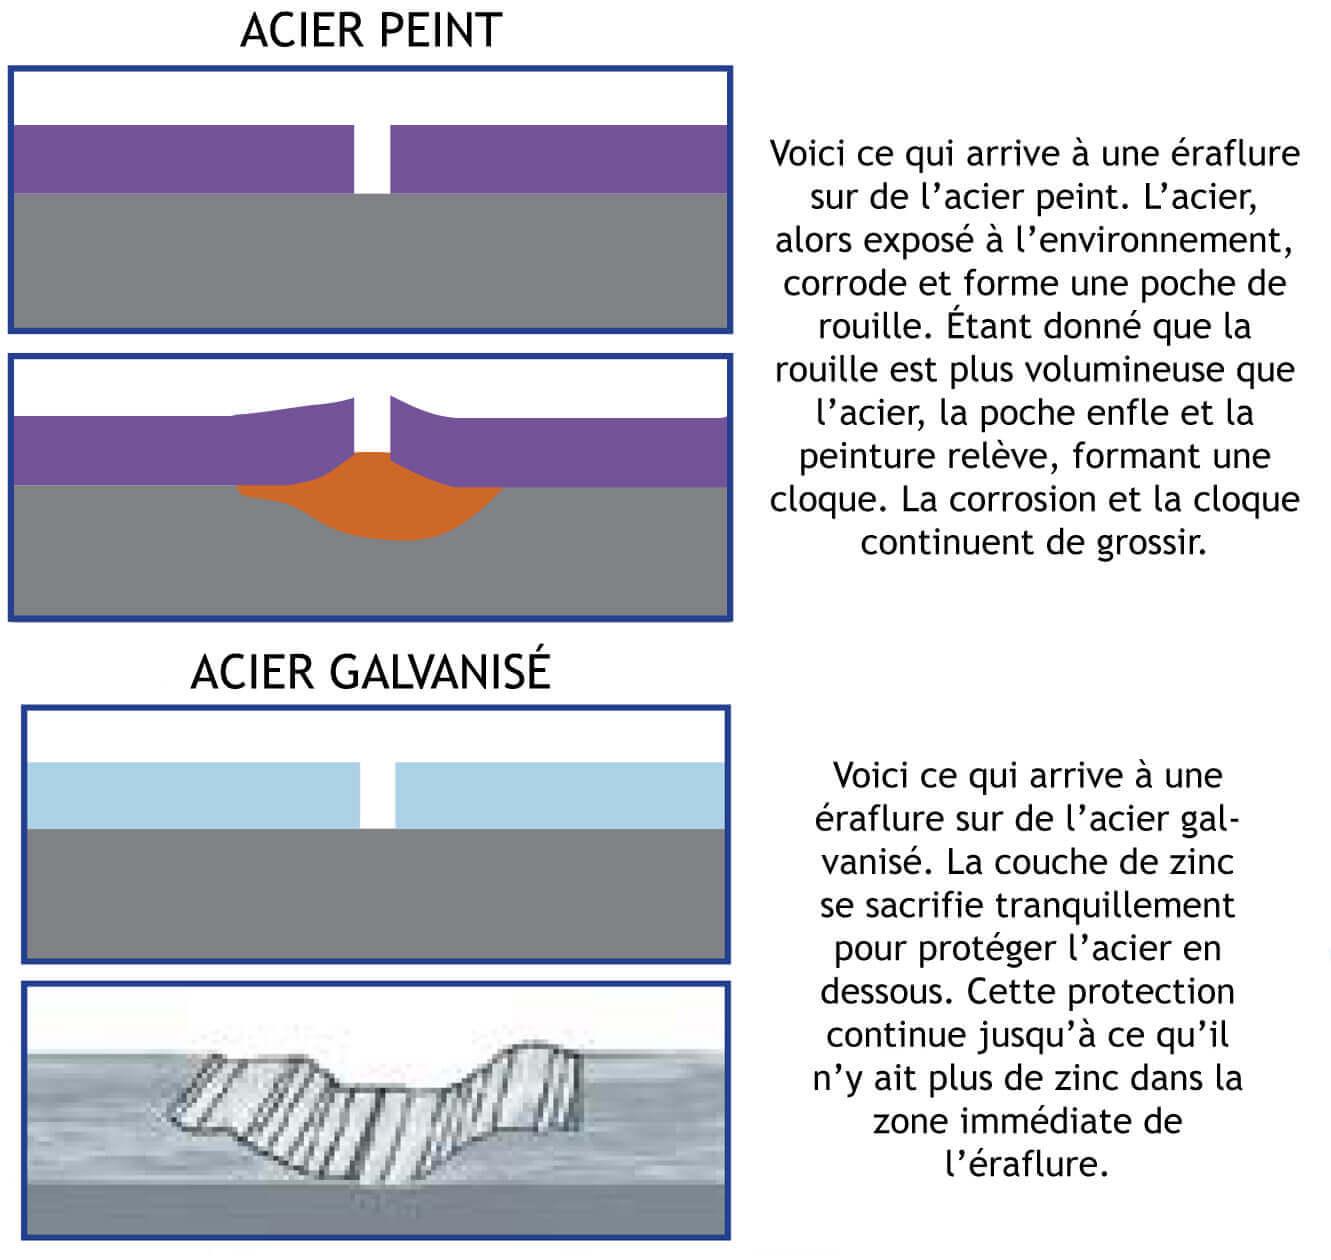 Acier peint vs acier galvanisé